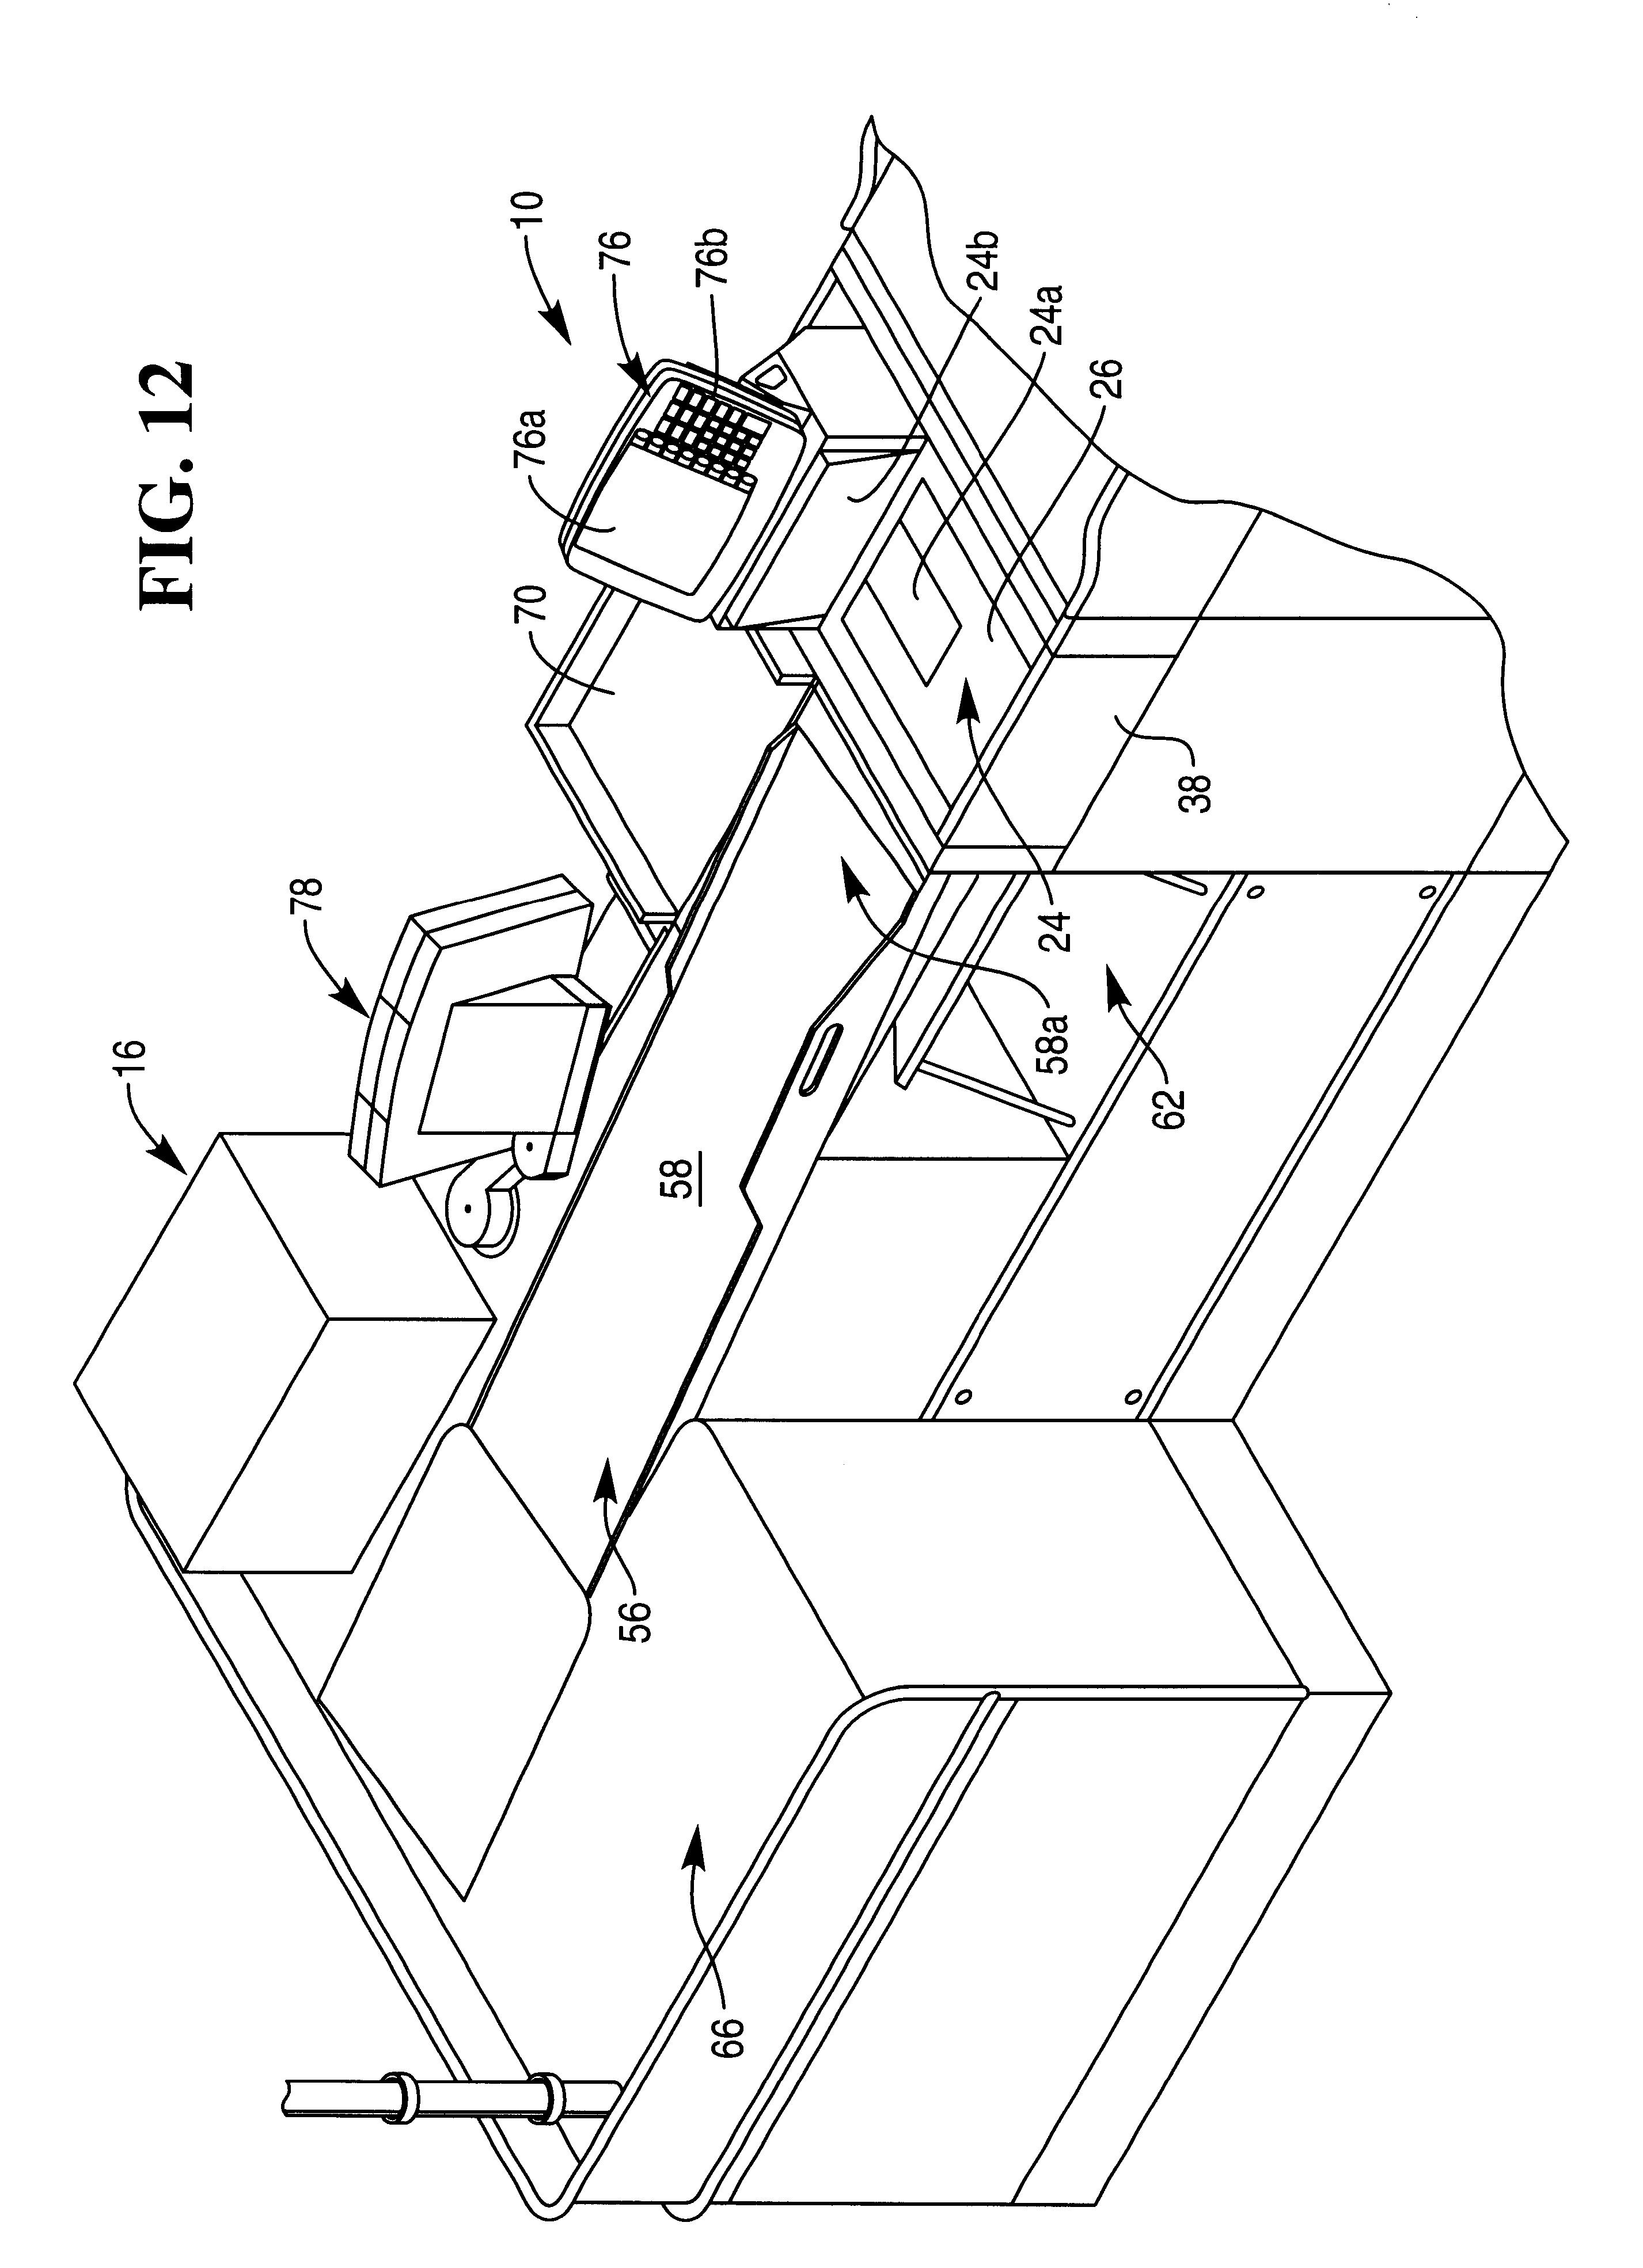 Patent US 6,394,345 B1